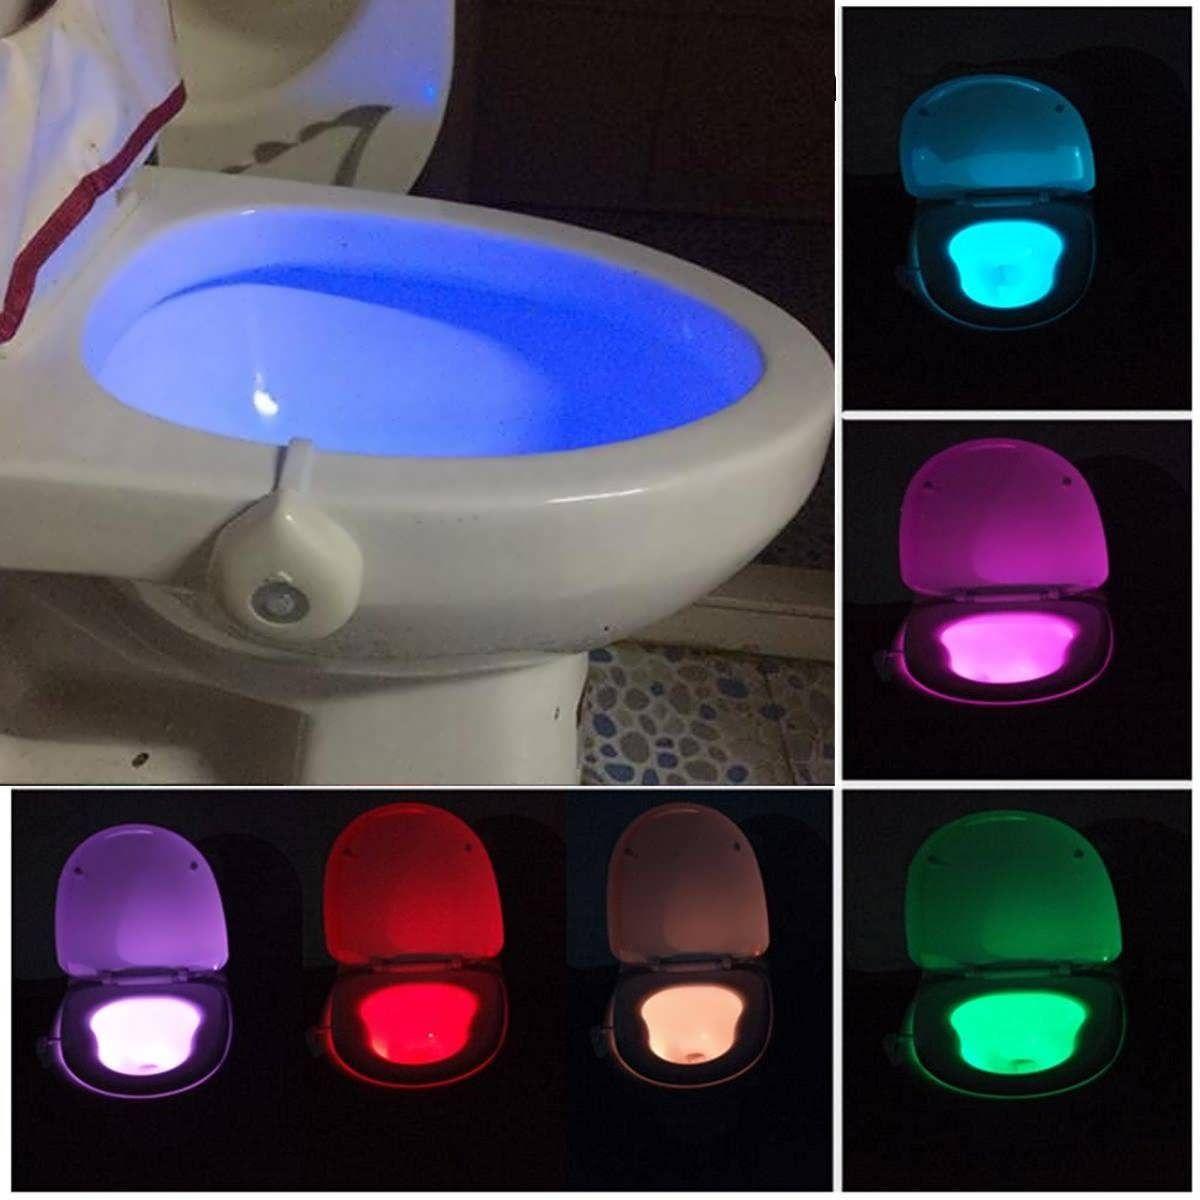 Good Motion Activated Toilet Night Light Bowl Bathroom LED 8 Color Lamp Sensor  Lights Worldwide Delivery.